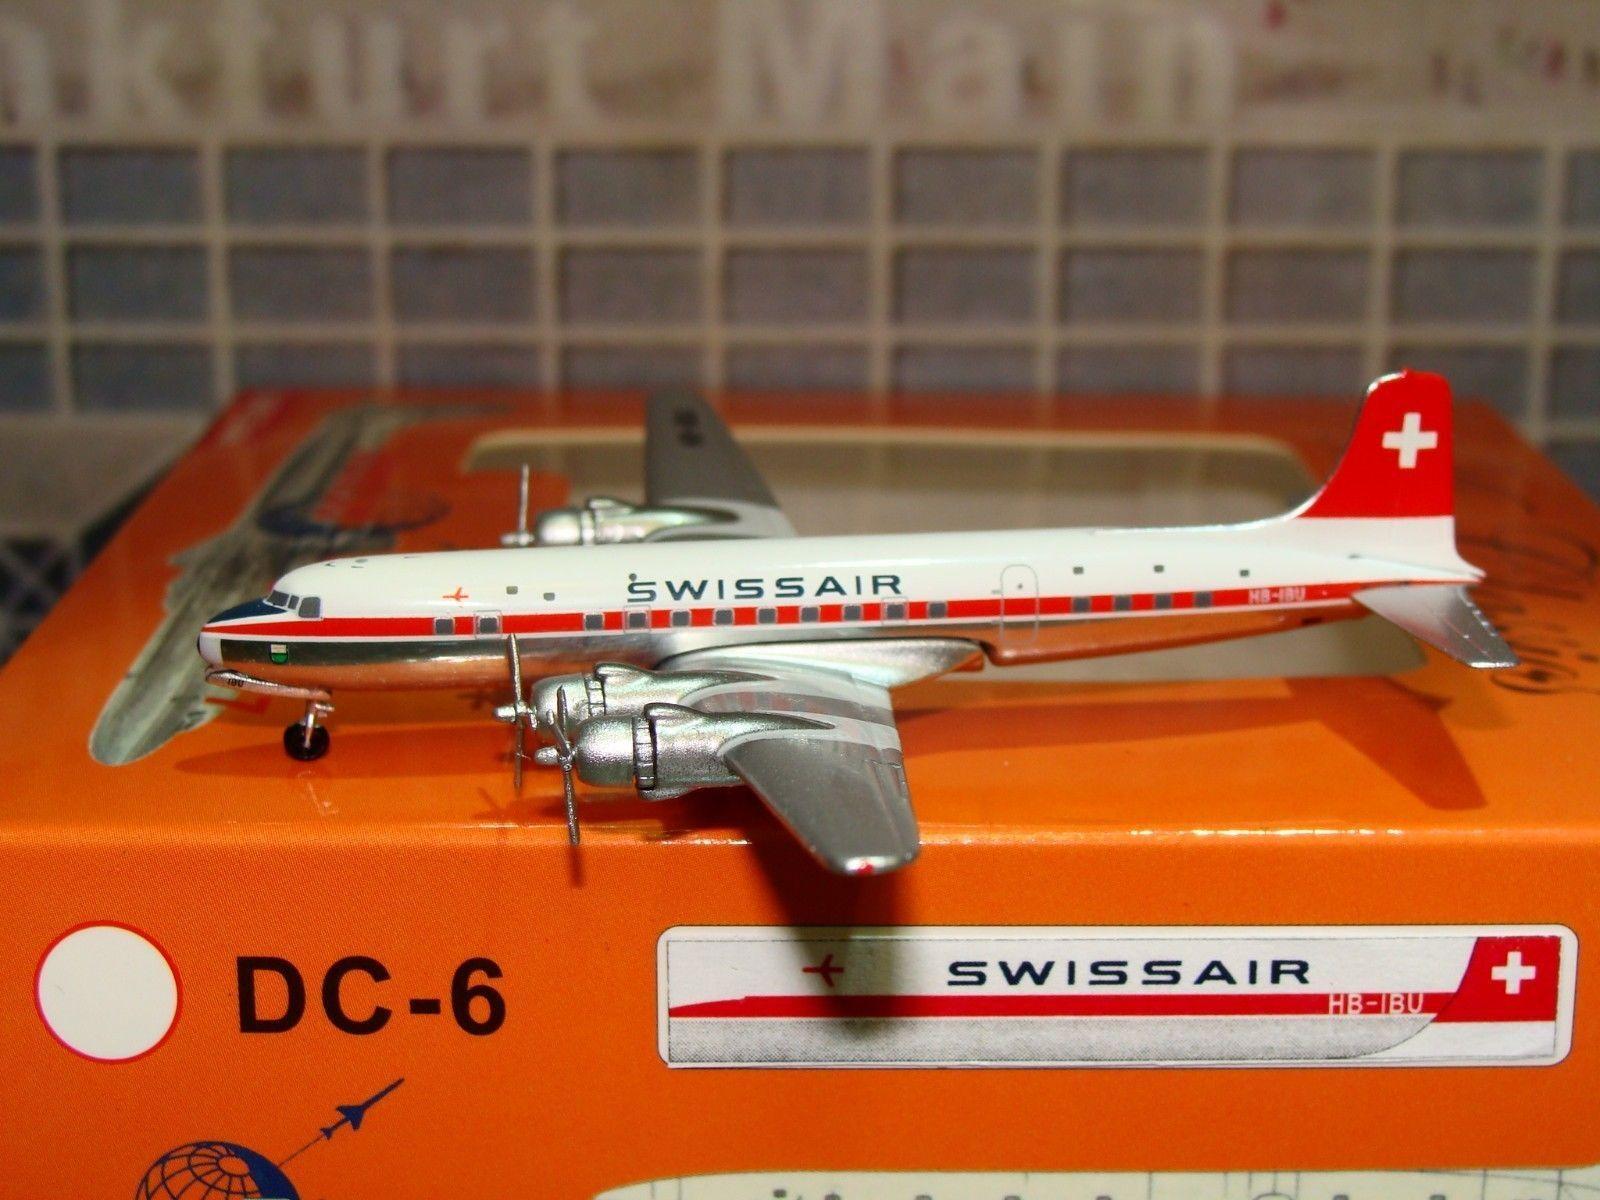 Swissair DC-6 (HB-IBU), 1 400 Aeroclassics